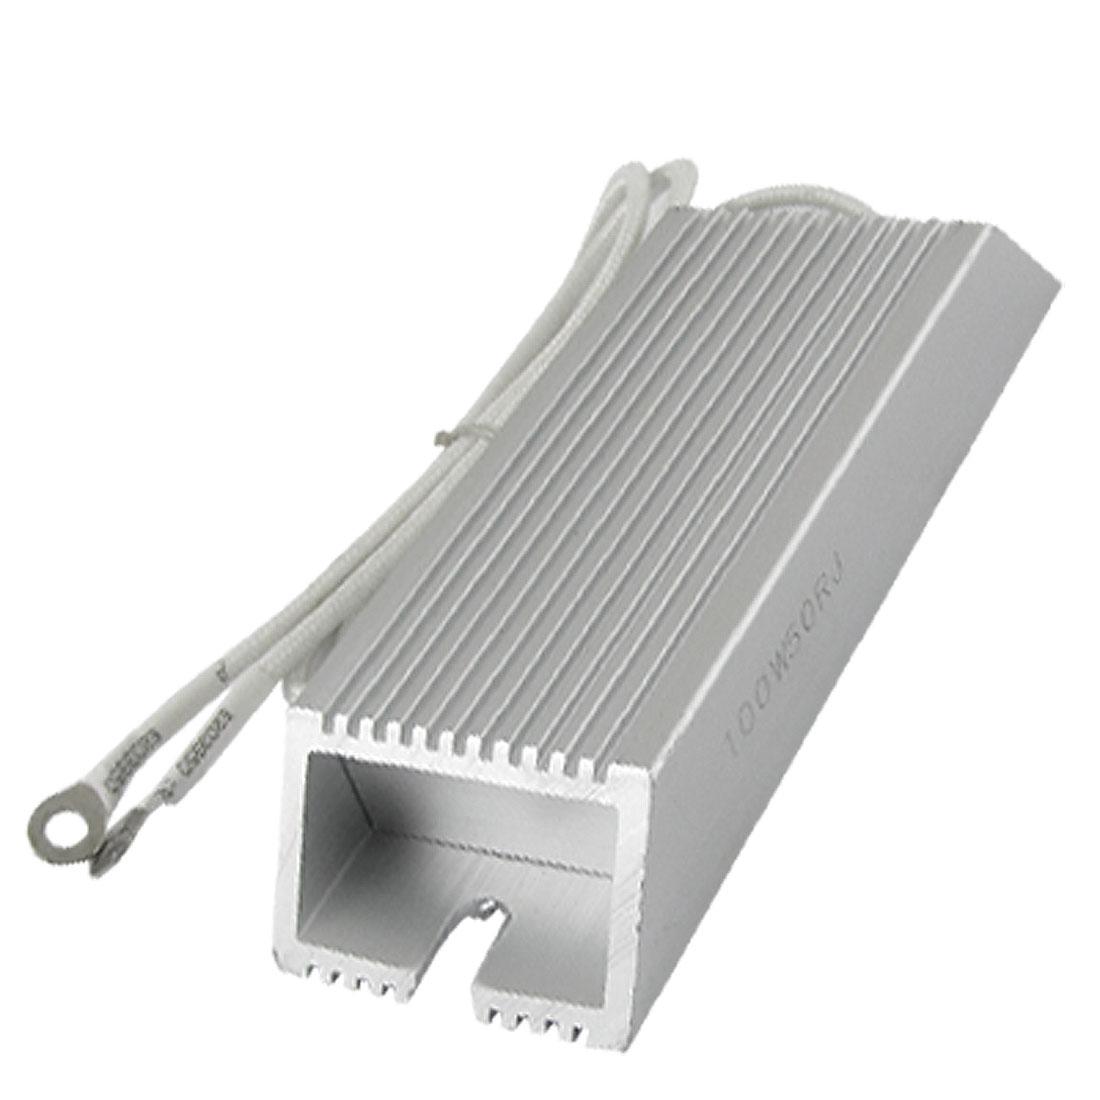 Silver Tone Aluminum Body Braking Resistor 100W 50 ohm